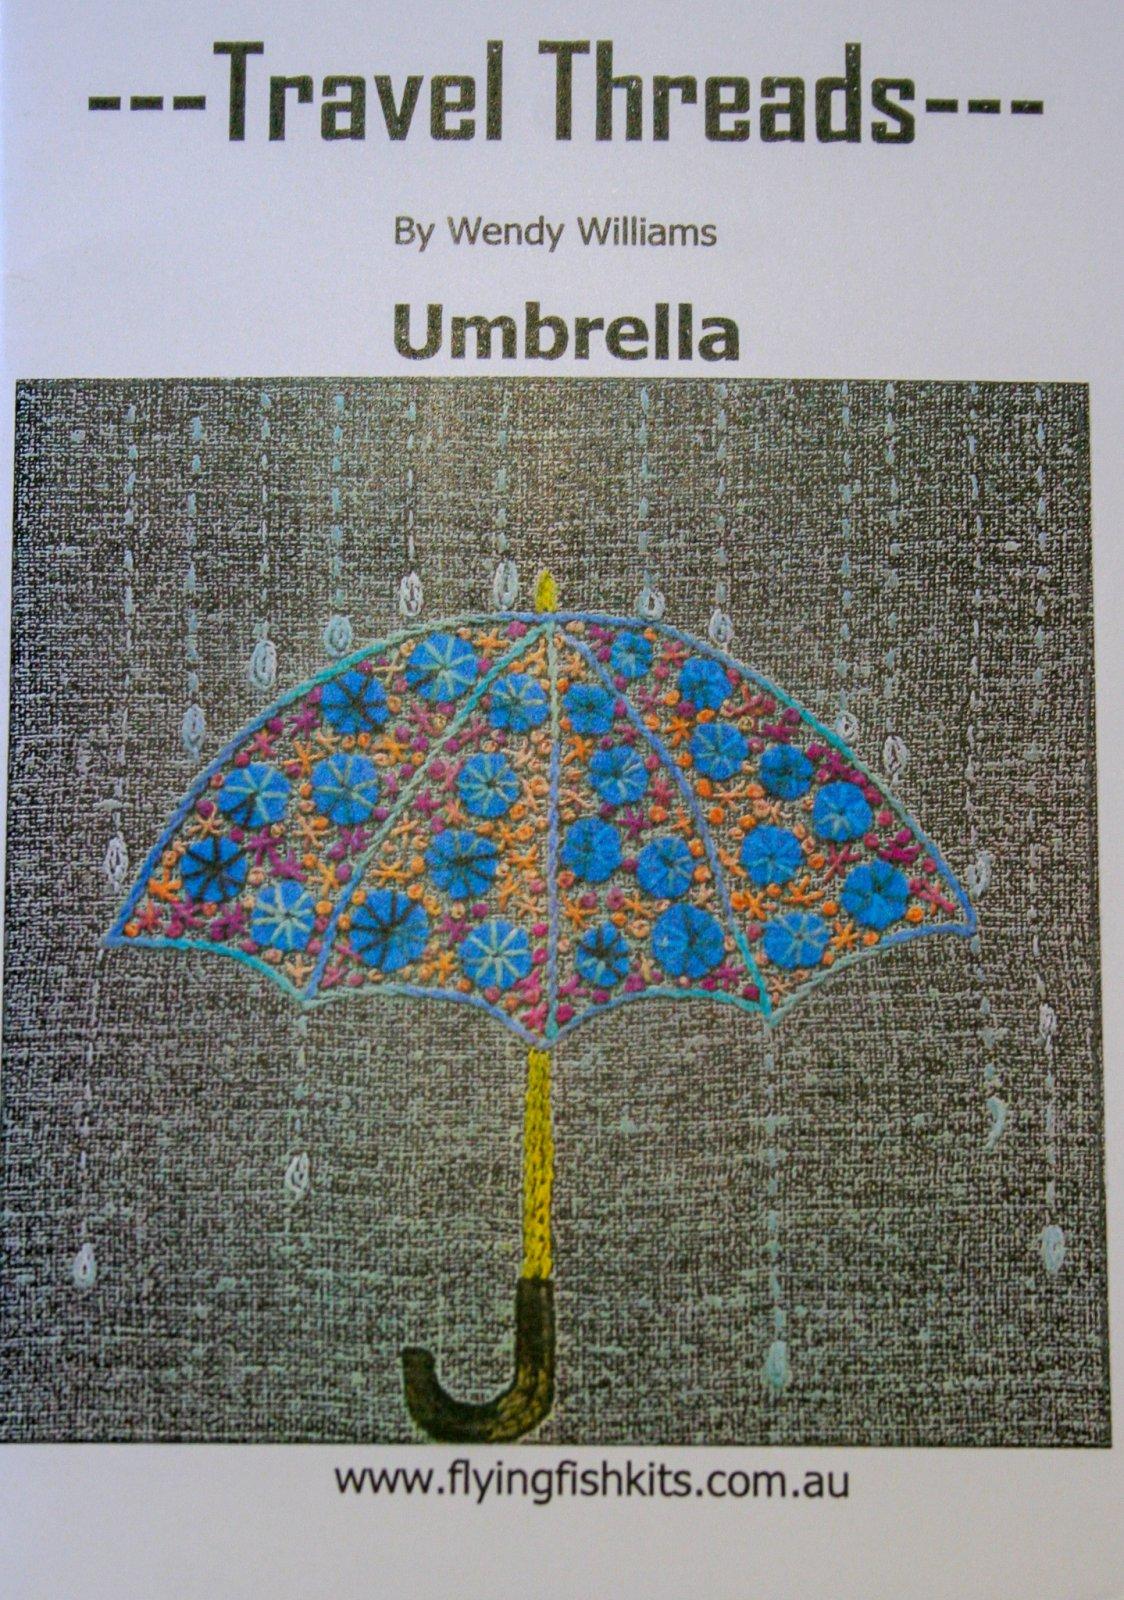 Wendy Williams : Travel Threads - Umbrella